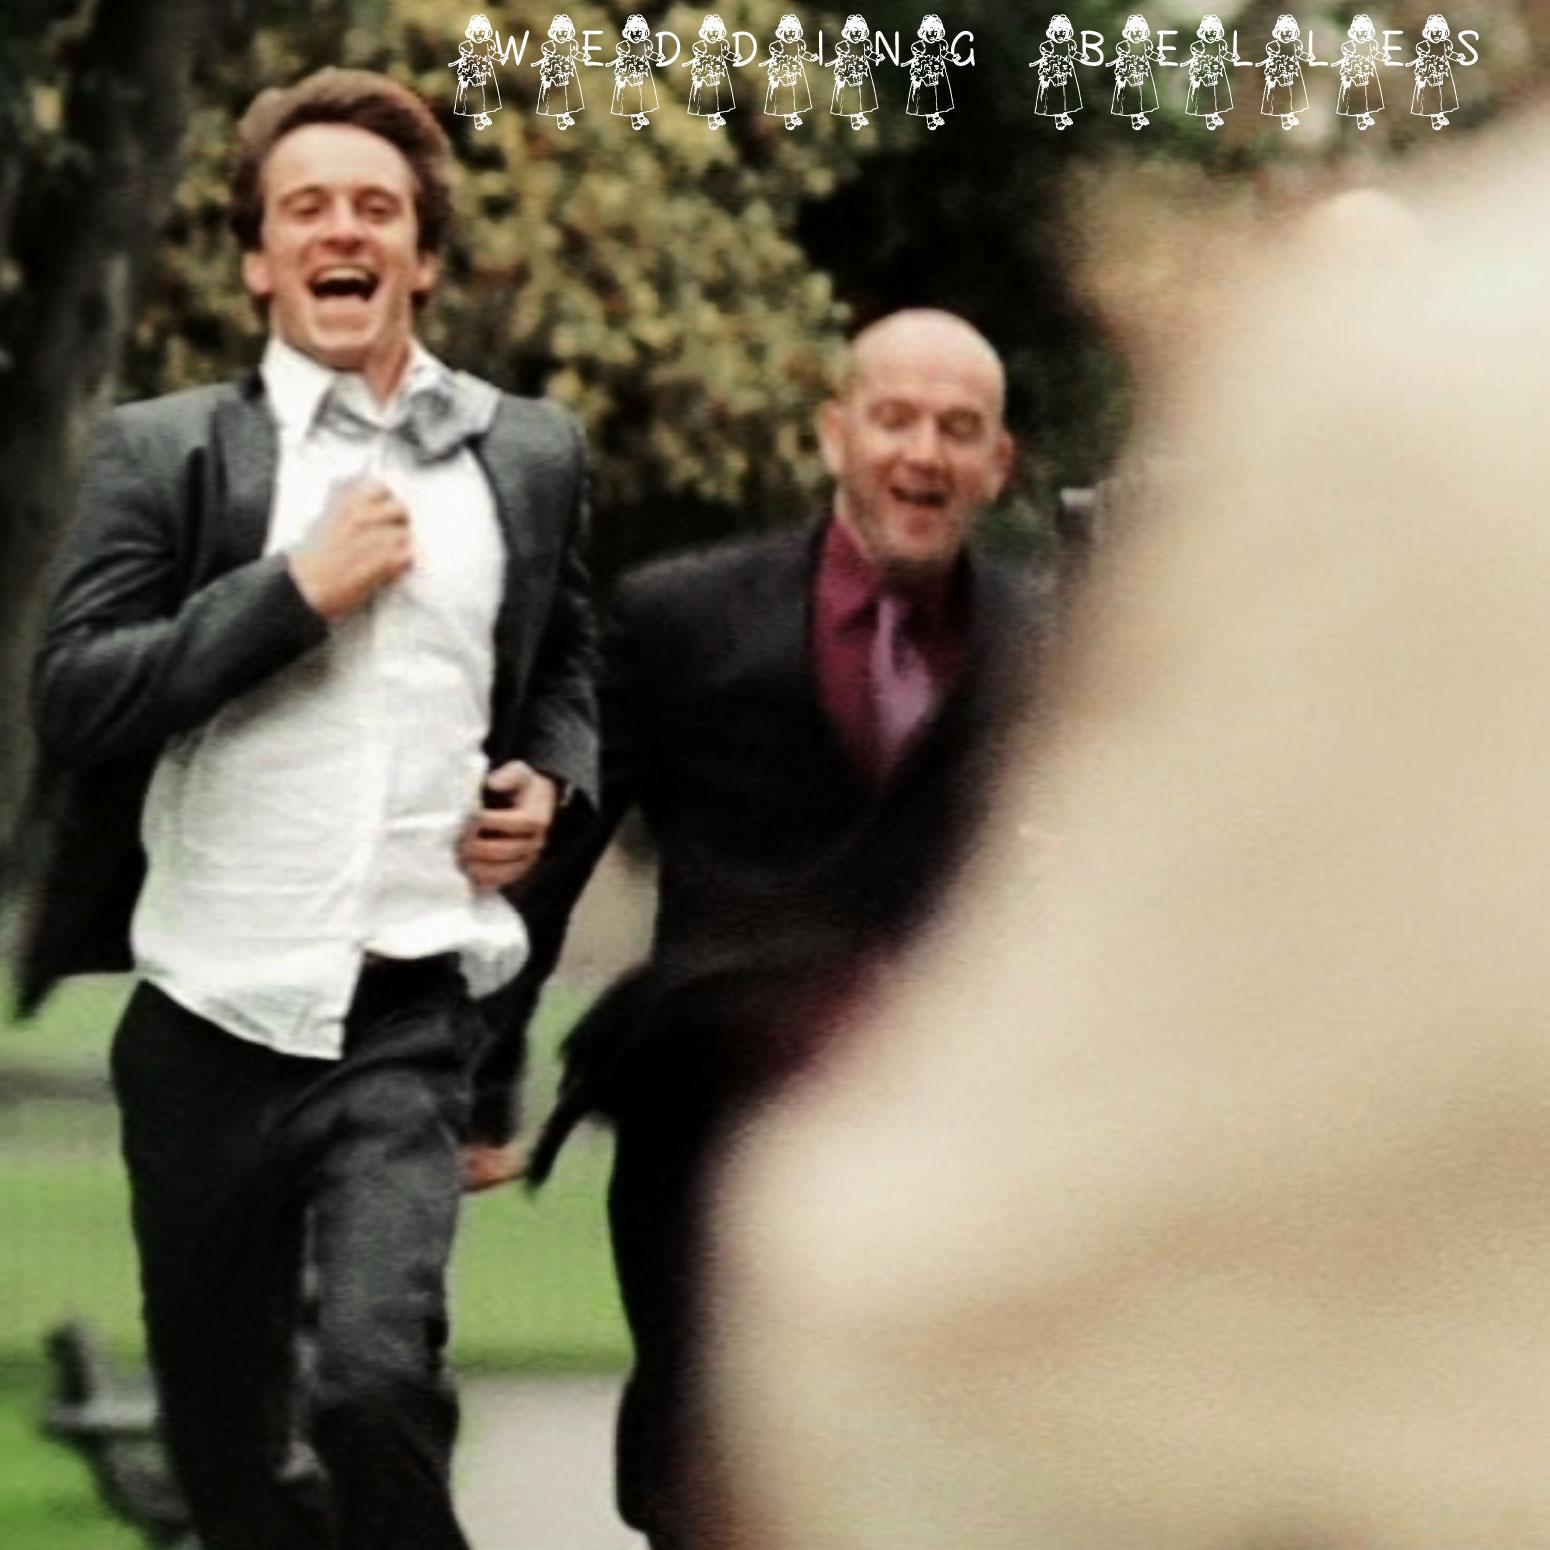 Michael Fassbender: Wedding Belles Michael Fassbender